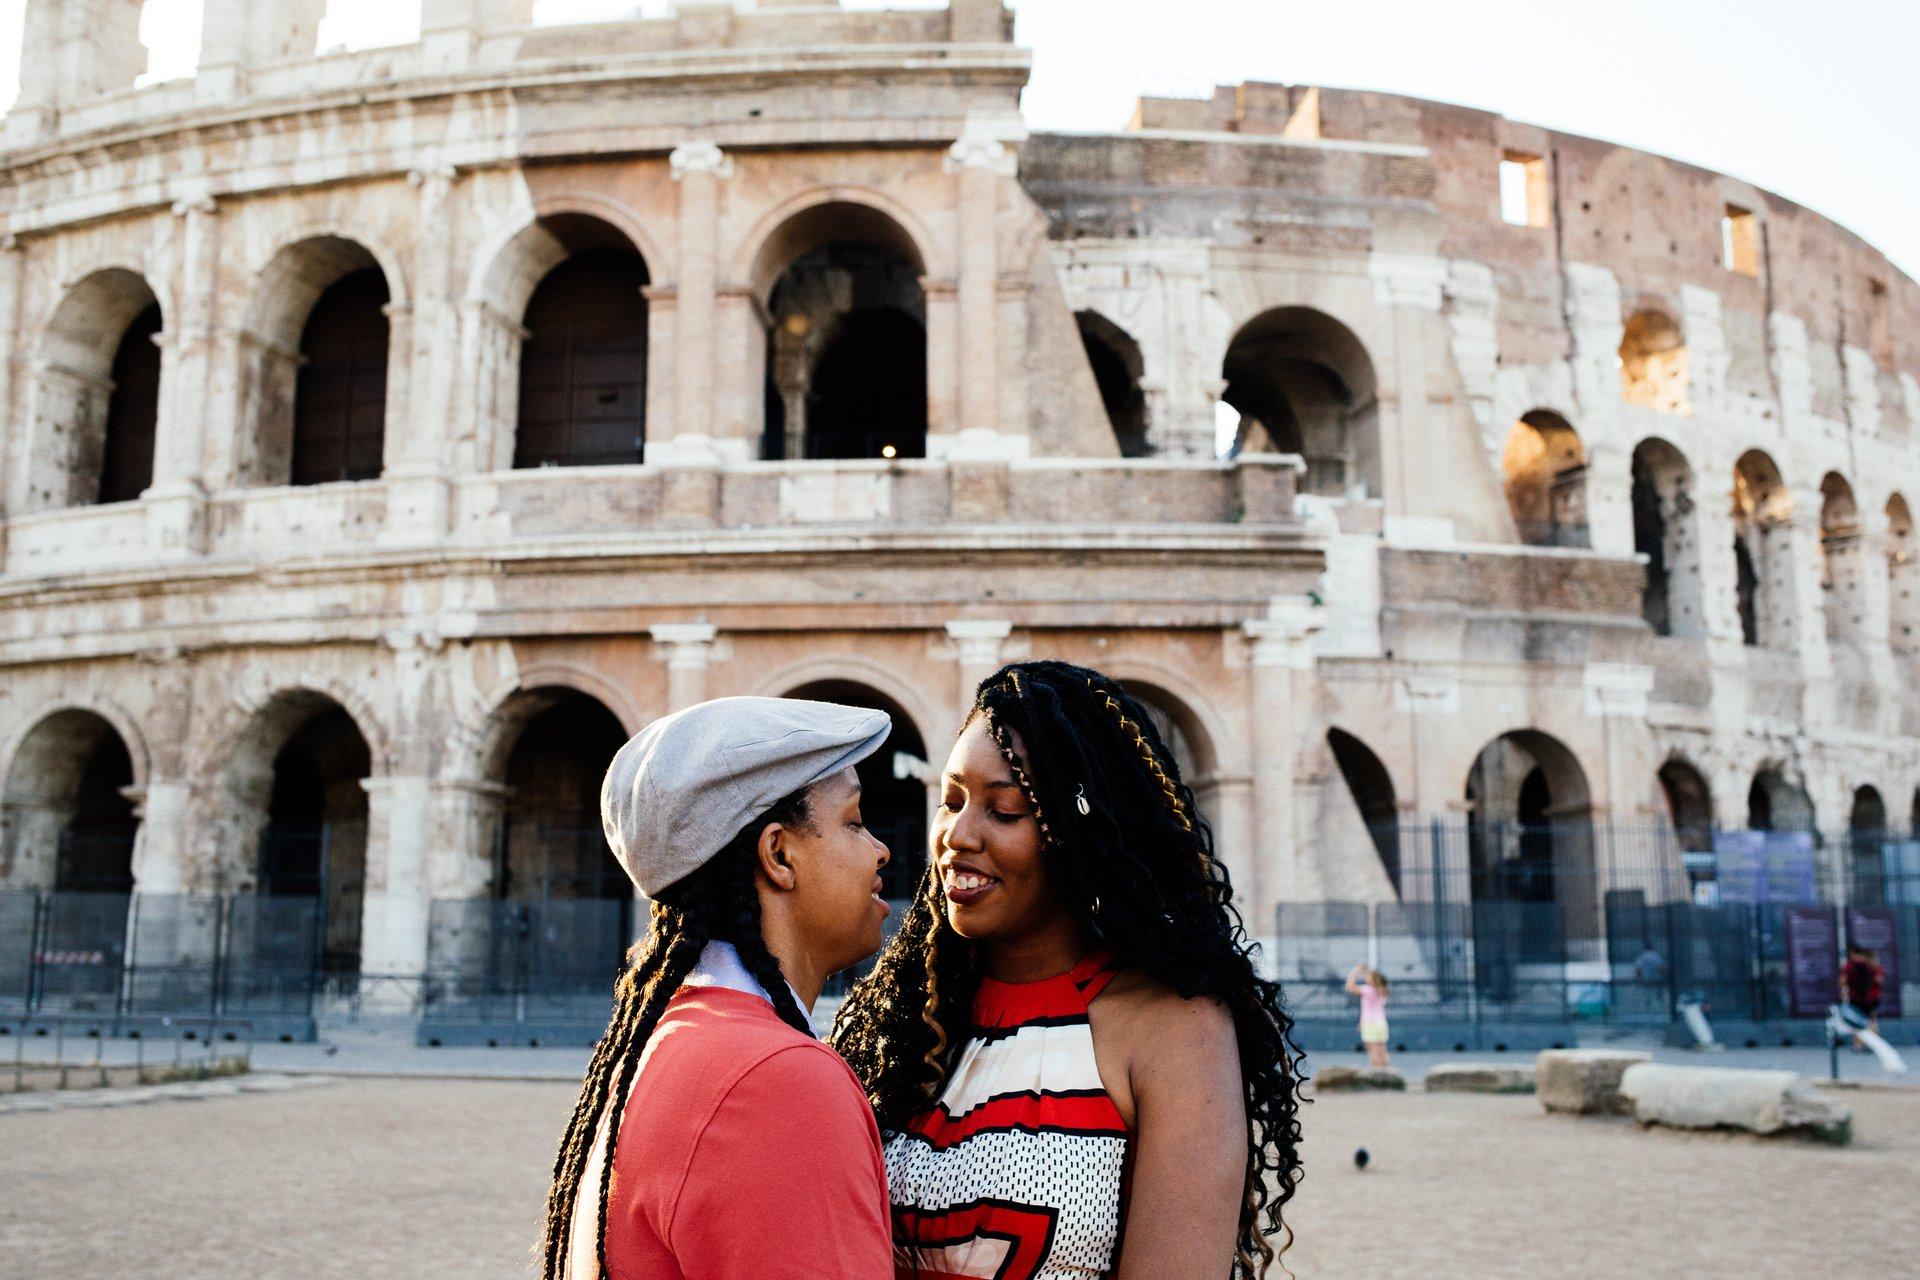 Rome-Italy-travel-story-Flytographer-58